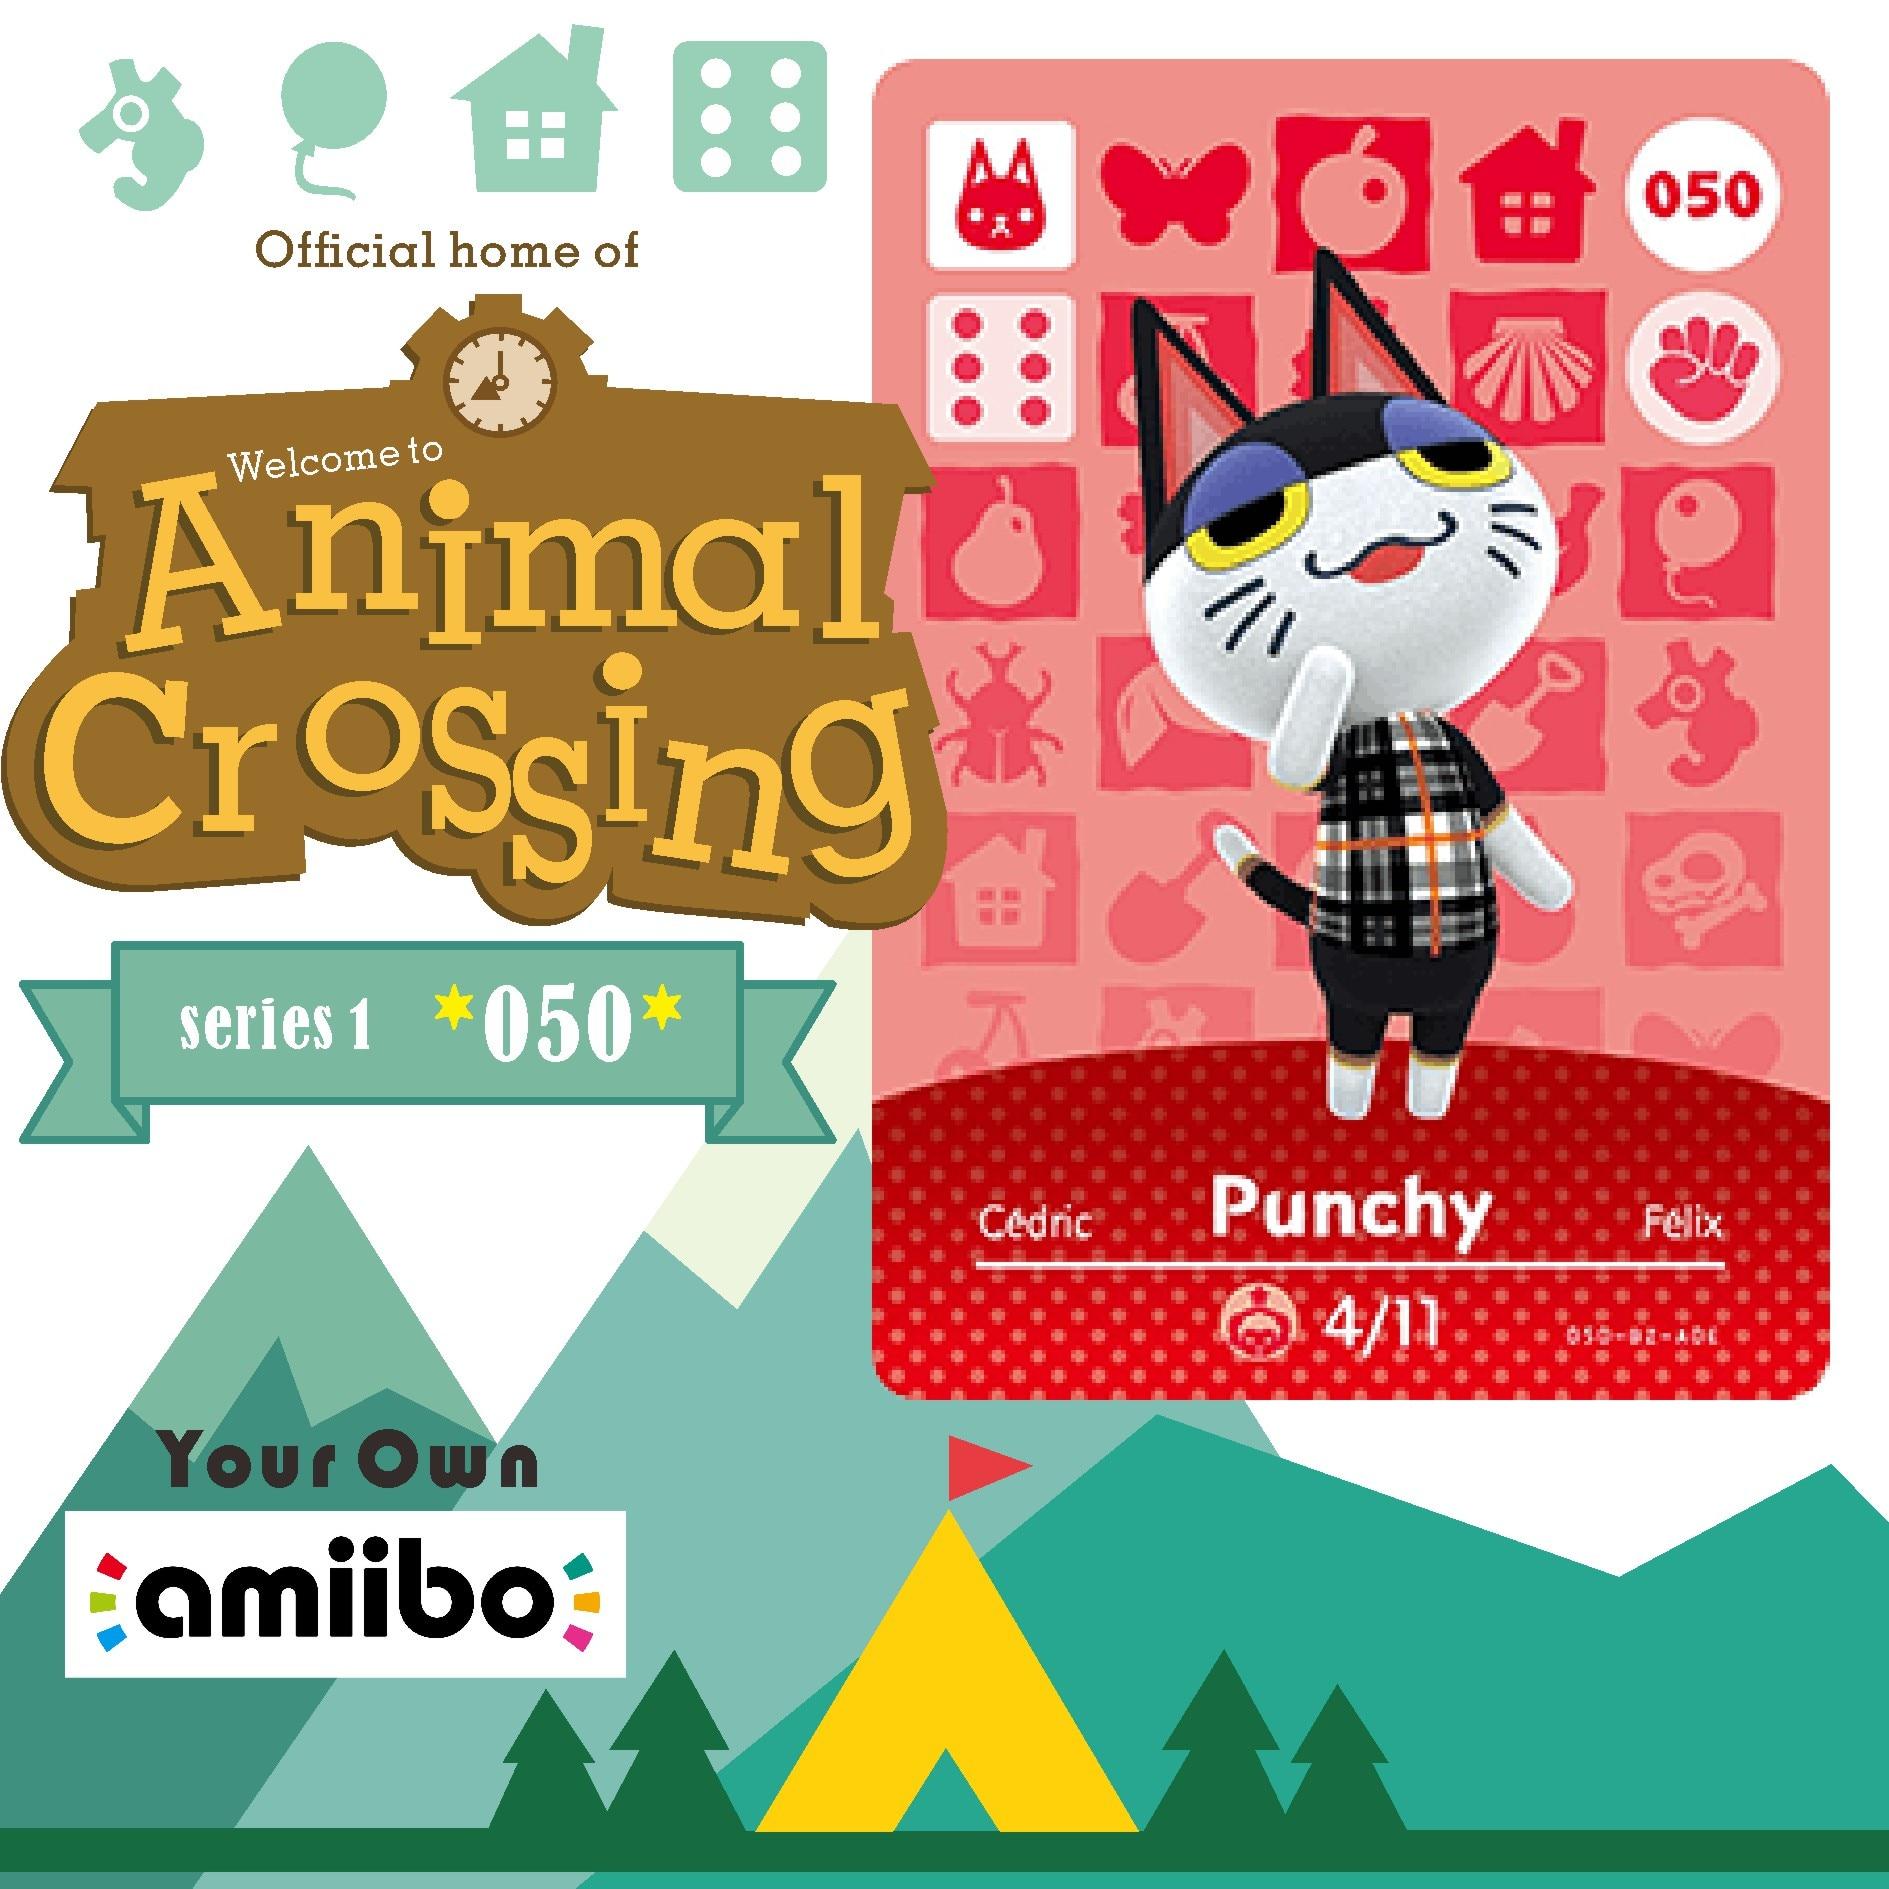 050 Punchy Amiibo Animal Crossing 50 Punchy Switch Rv Welcome Amiibo Card Nfc Figure Card Animal Crossing Amiboo Animal Crossing 1